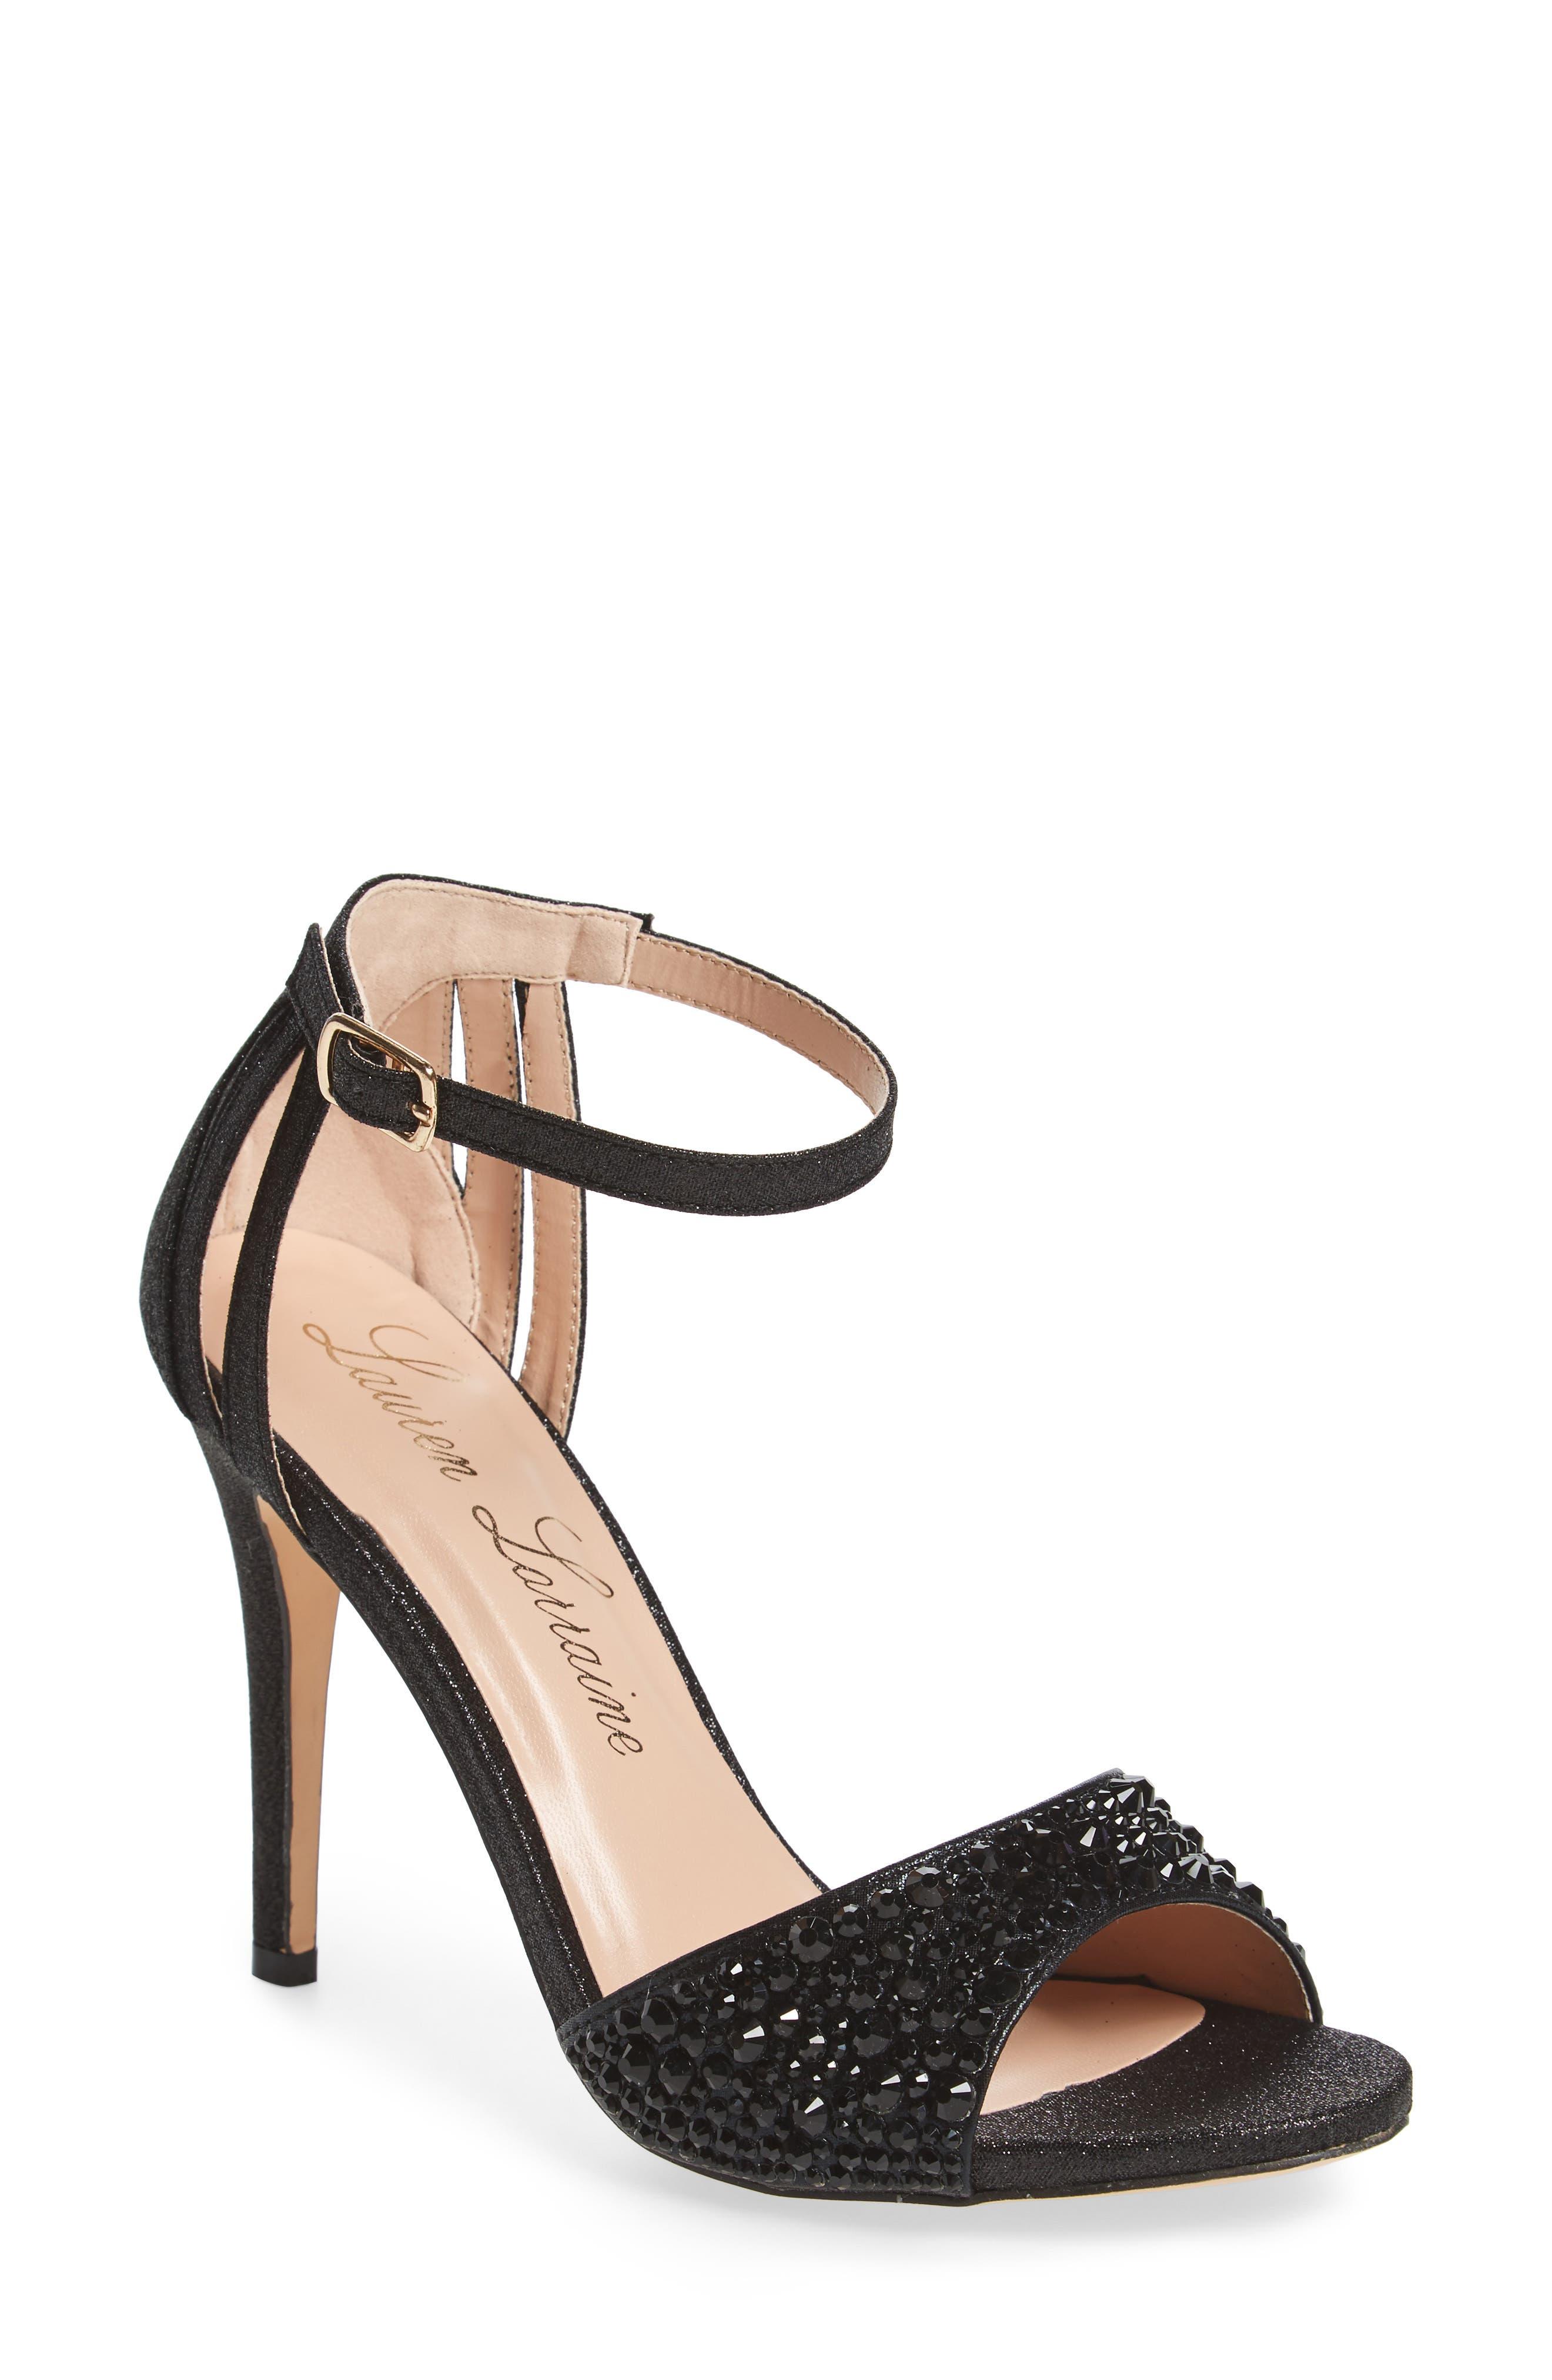 Main Image - Lauren Lorraine Maddy Embellished Sandal (Women)